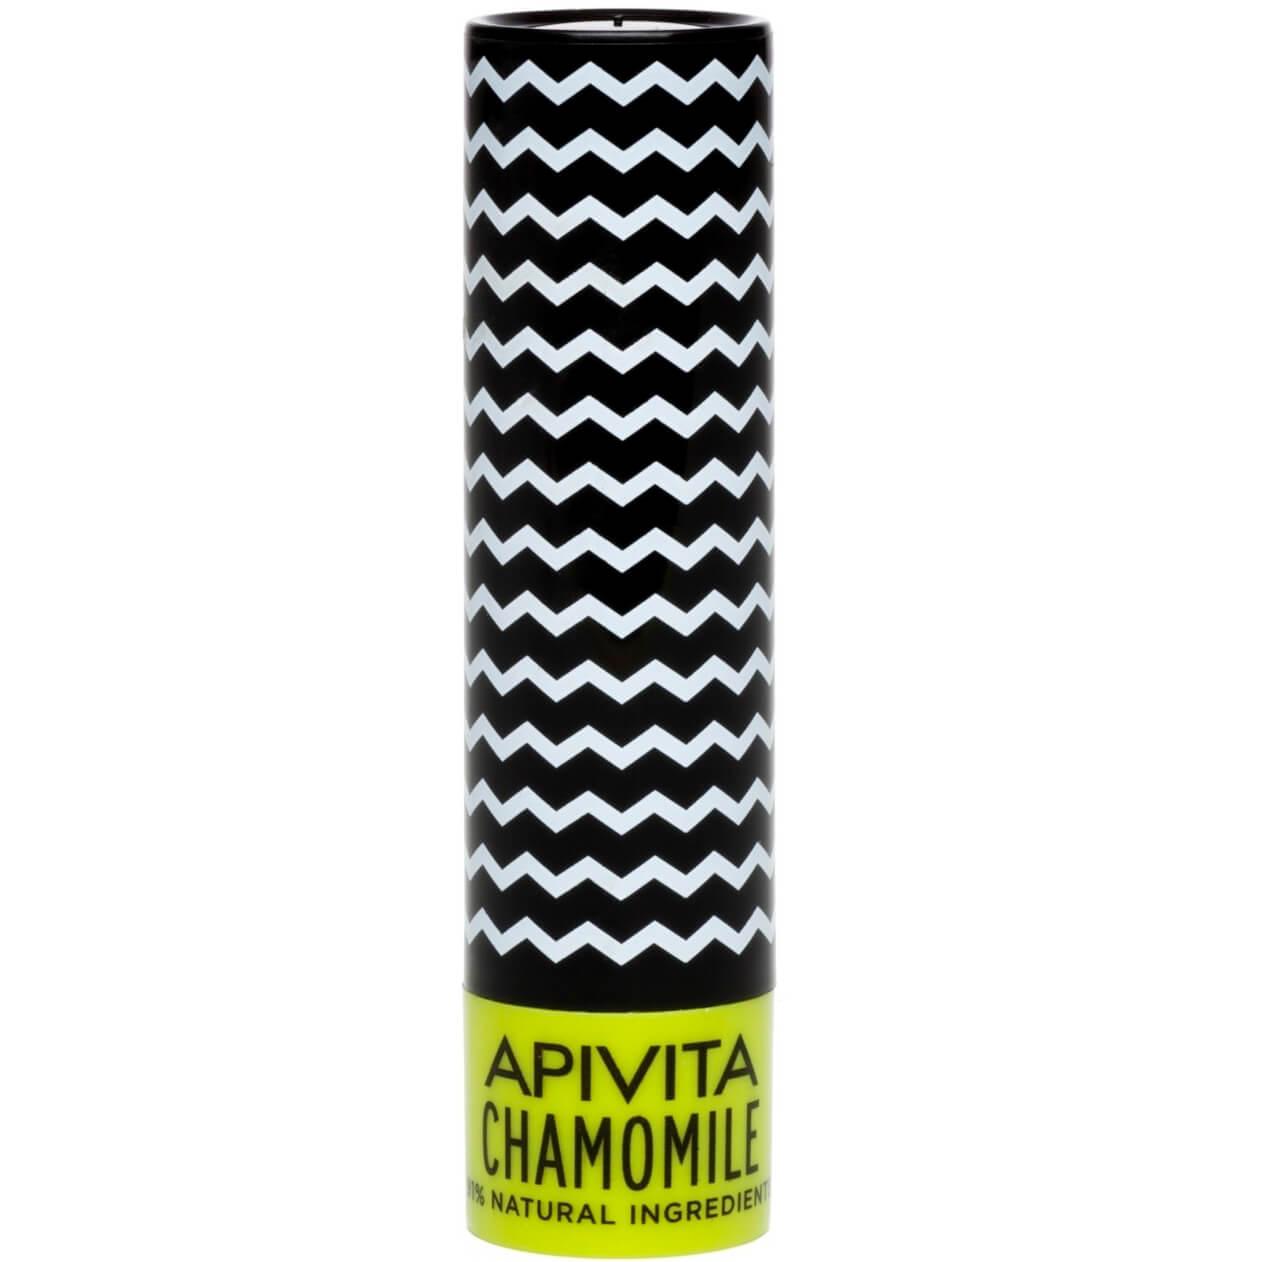 Apivita Lip Care Ενυδατικά Lip Balm Χειλιών 4.4g – Chamomile